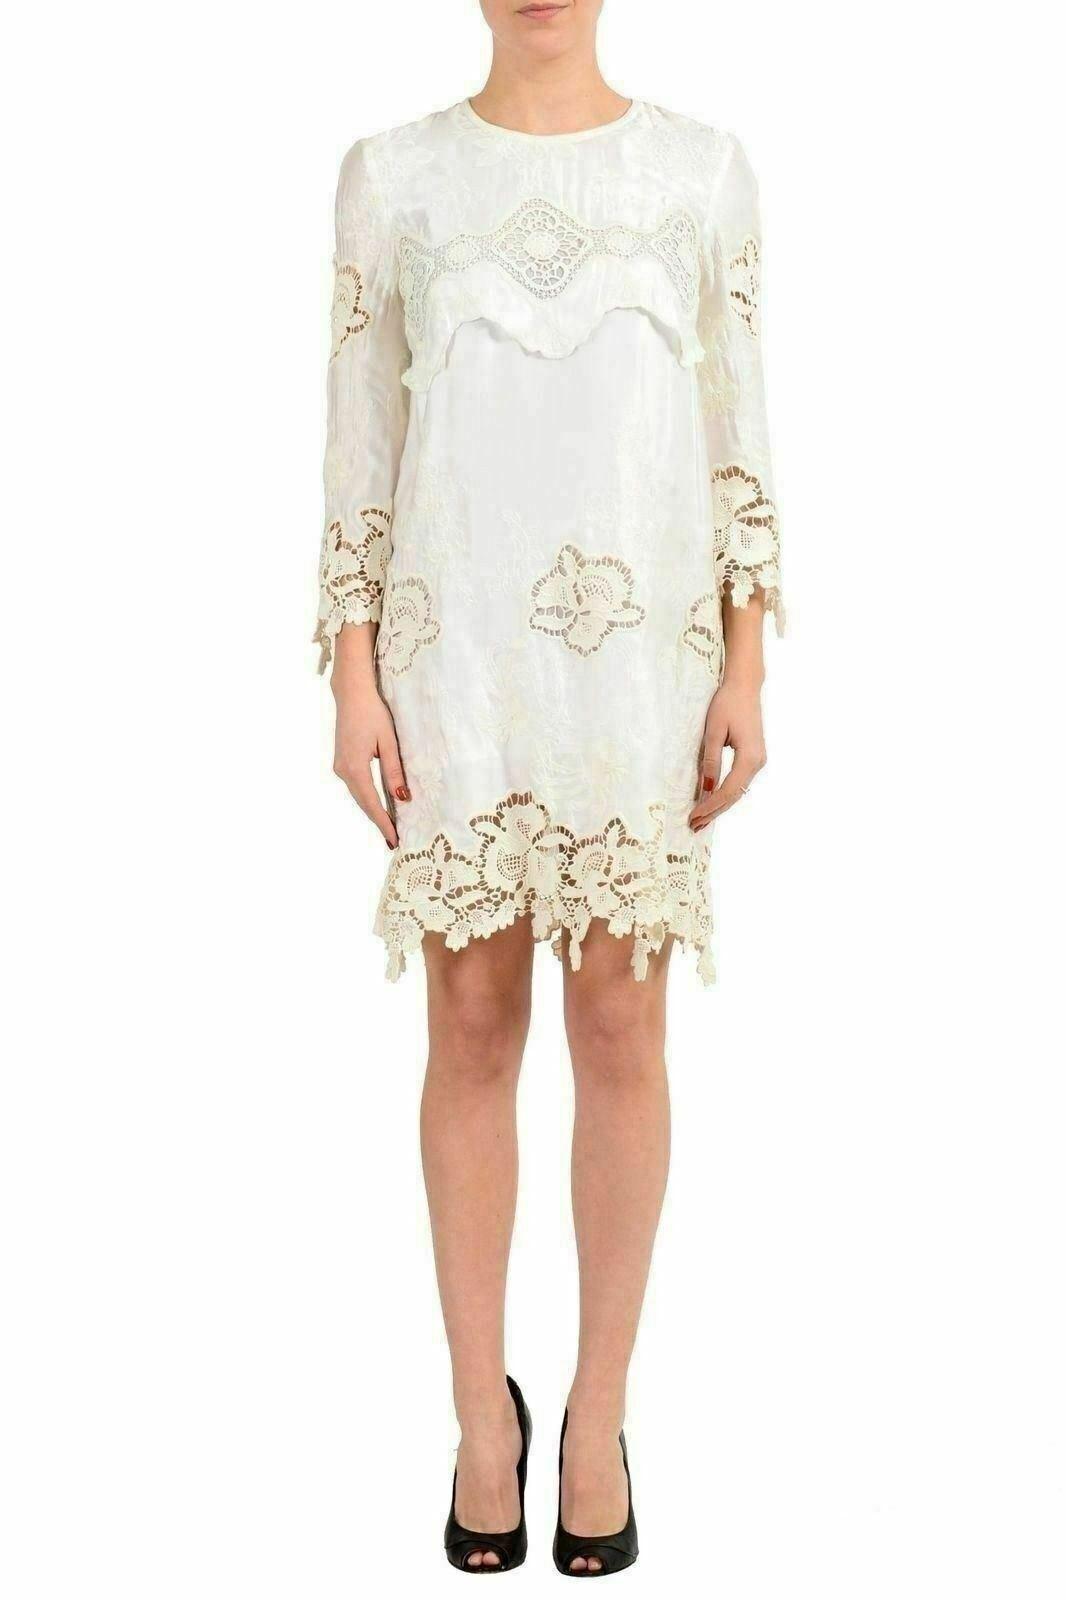 Just Cavalli White 3 4 Sleeve Women's Sheath Dress US S IT 40